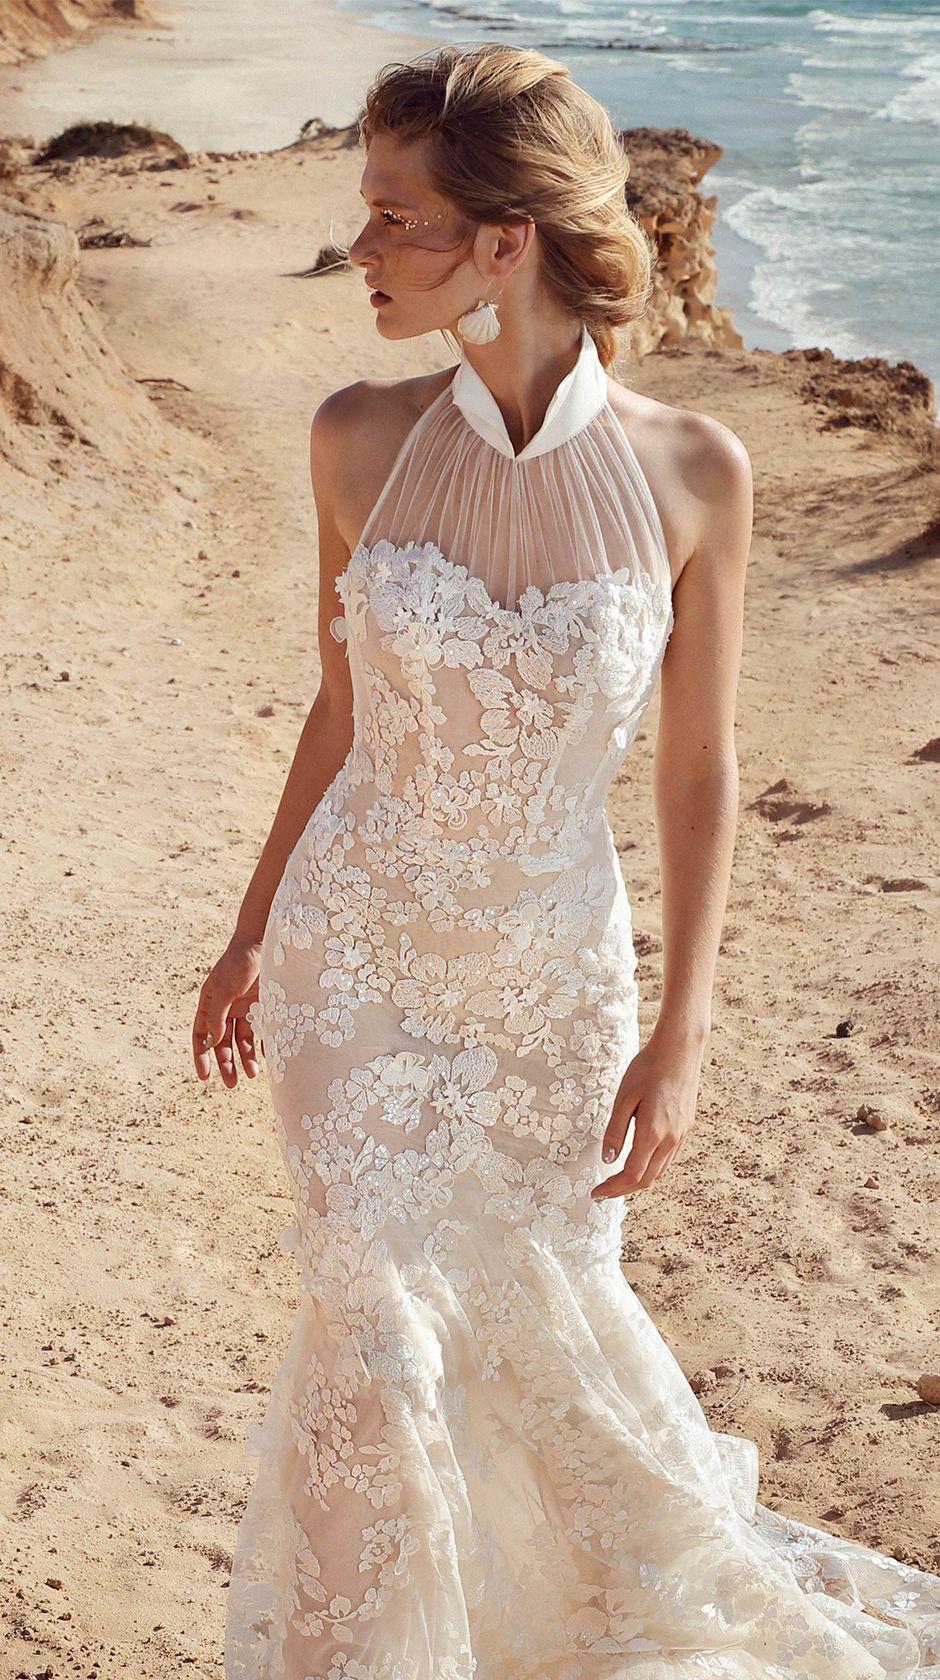 G 405 Summer Wedding Dress Wedding Dress Styles Fit And Flare Wedding Dress [ 1680 x 940 Pixel ]